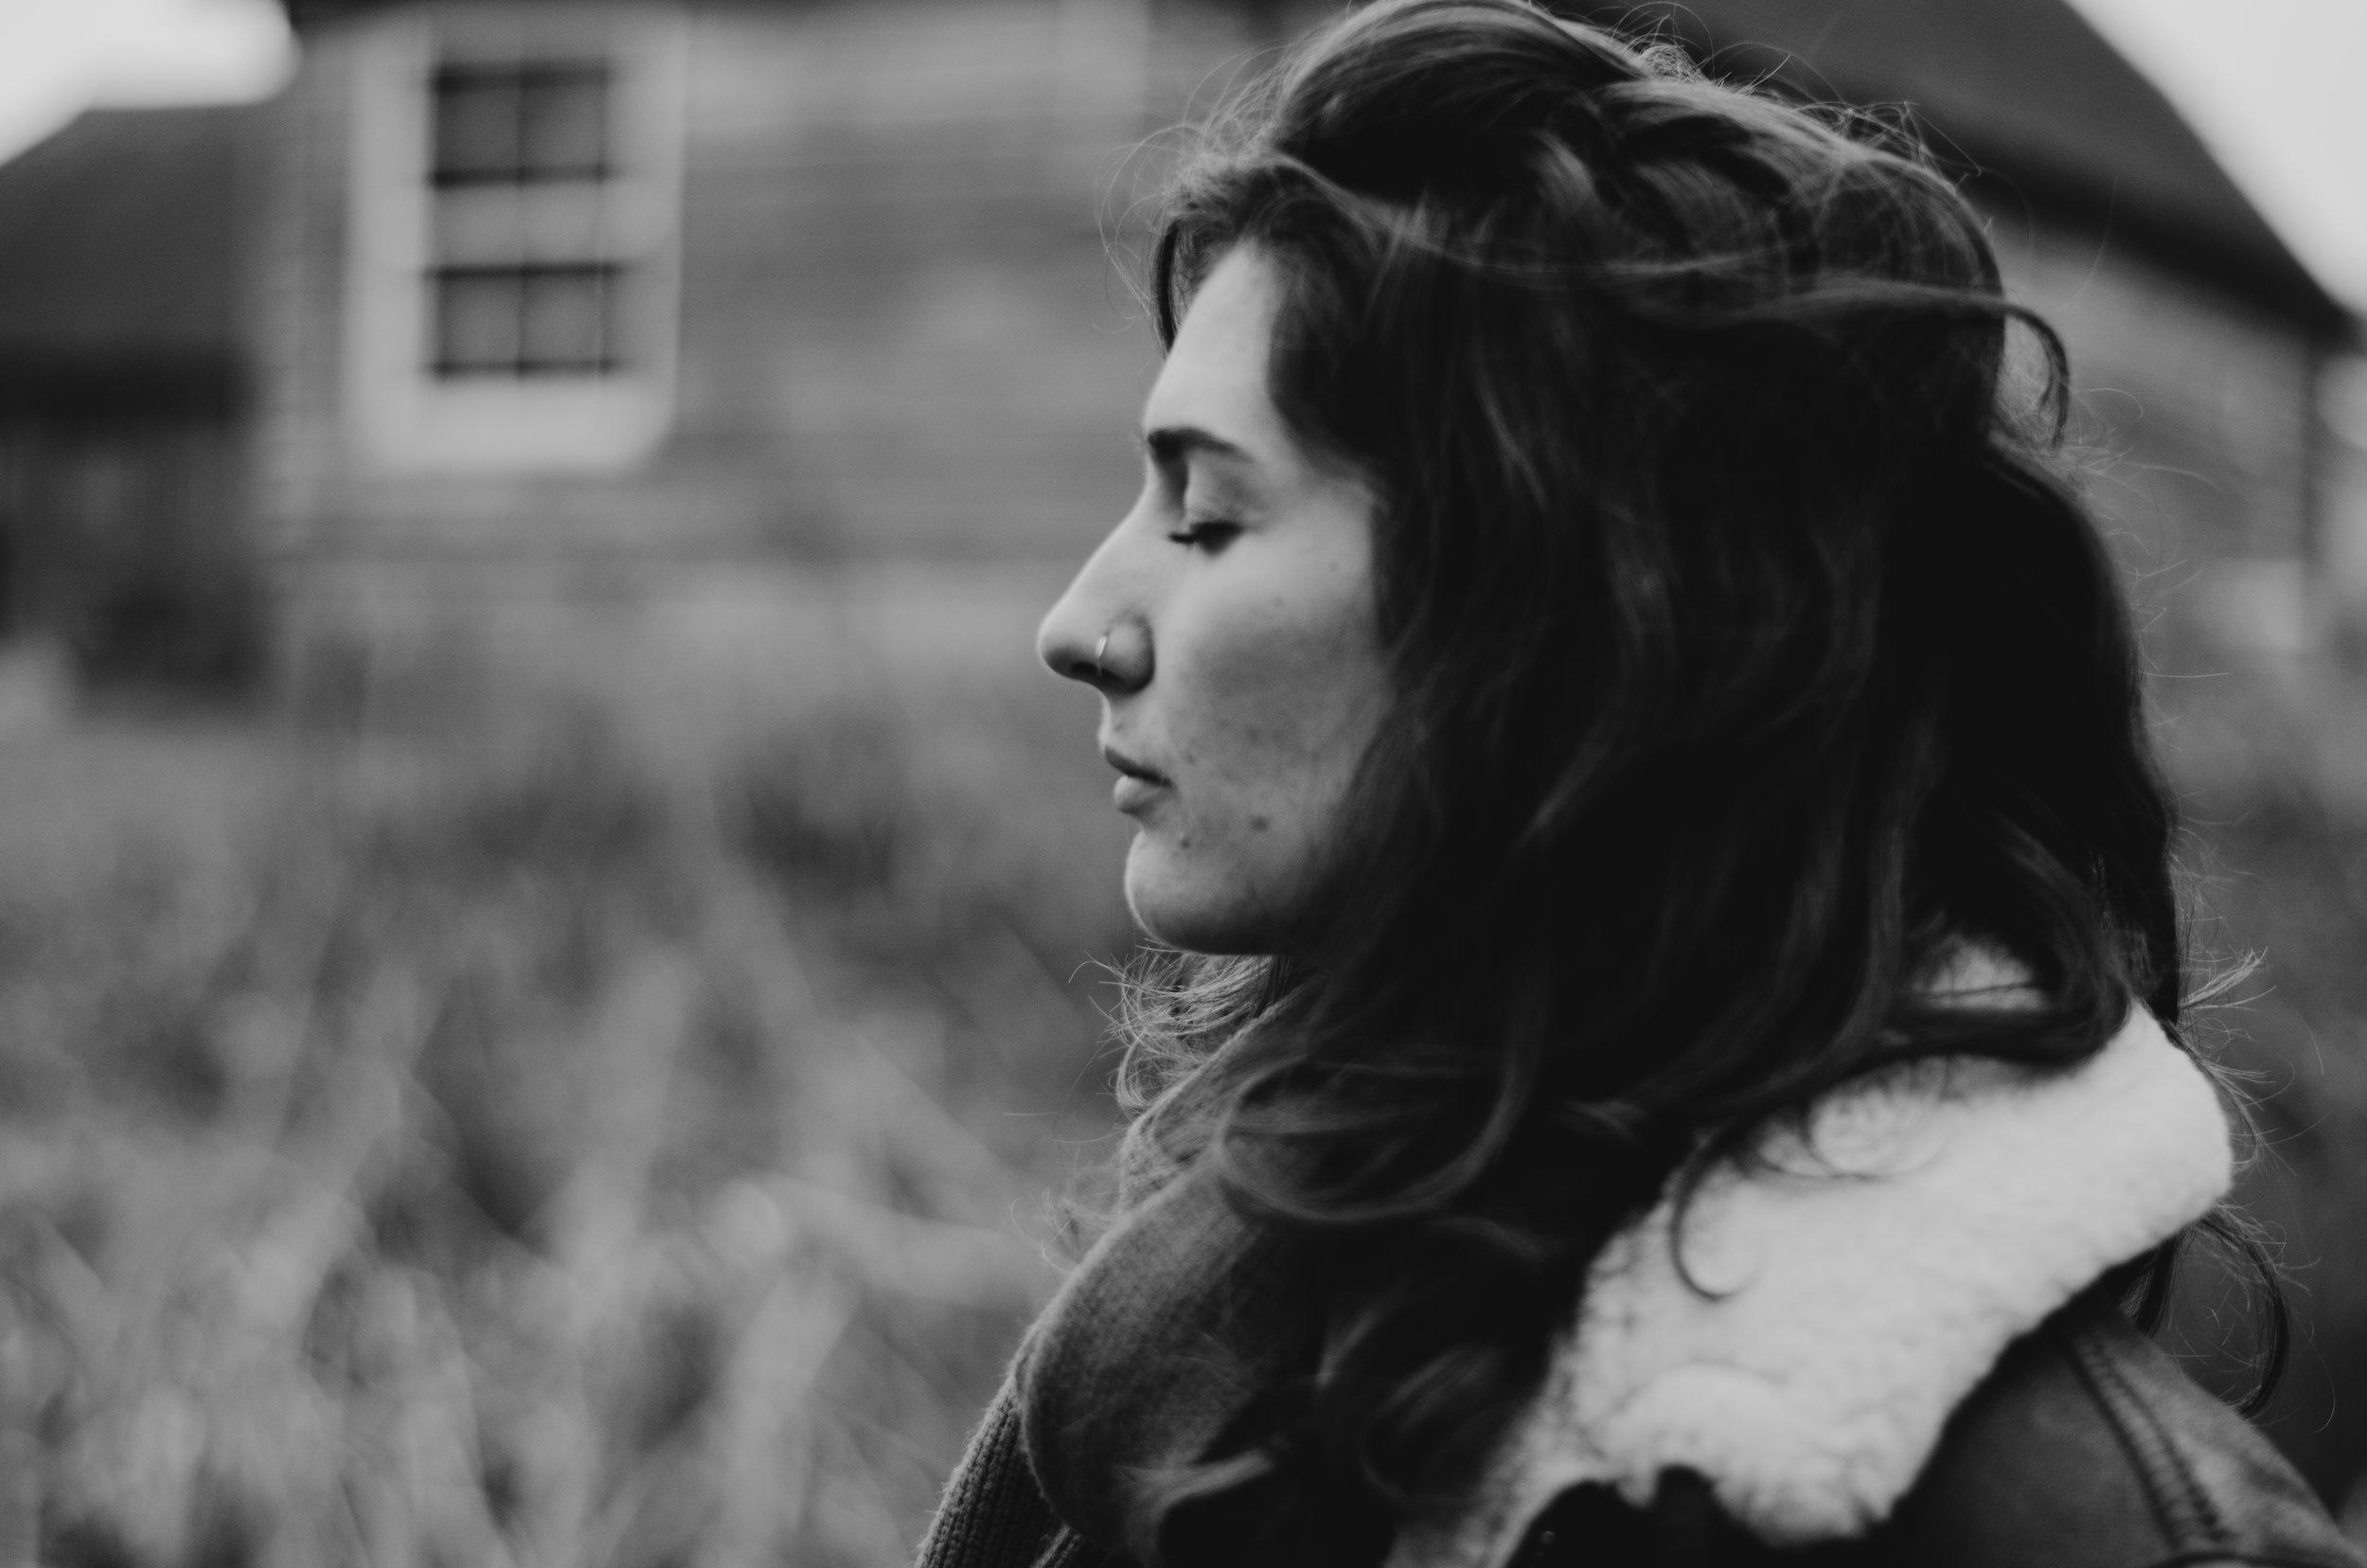 Chloe - Portraits - Aiste Saulyte Photography - 2018-01-05-5.jpg